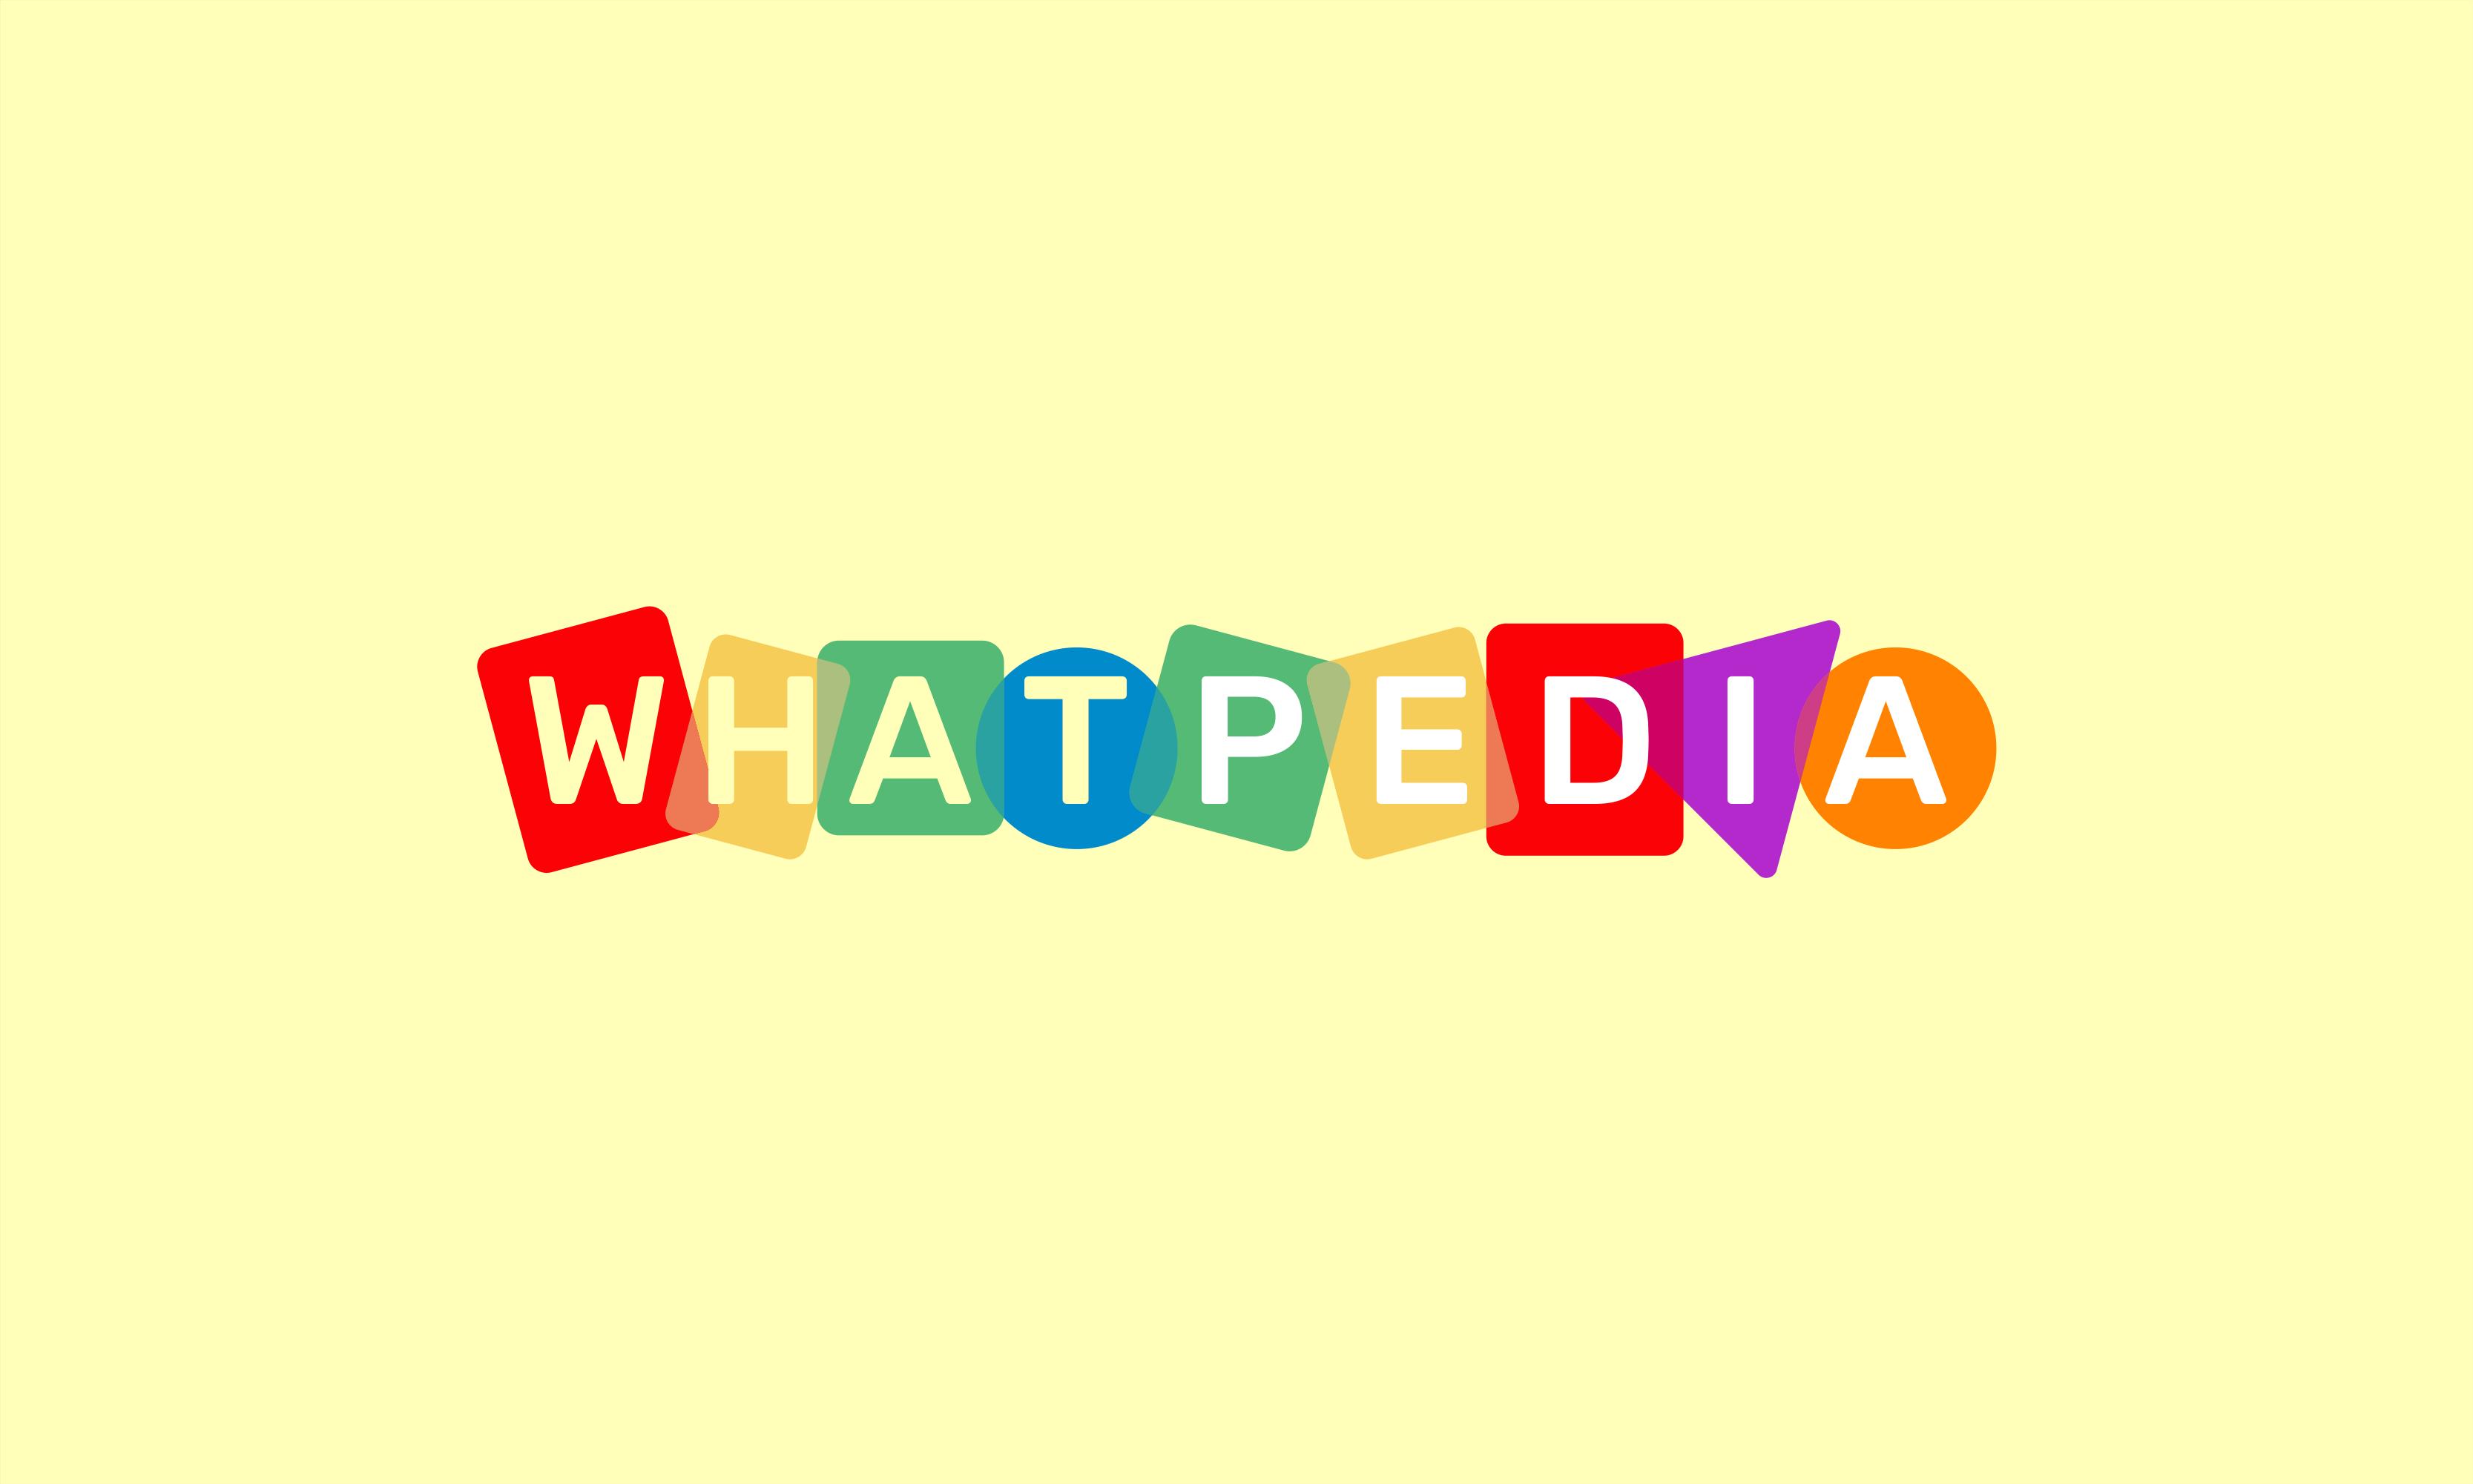 Whatpedia